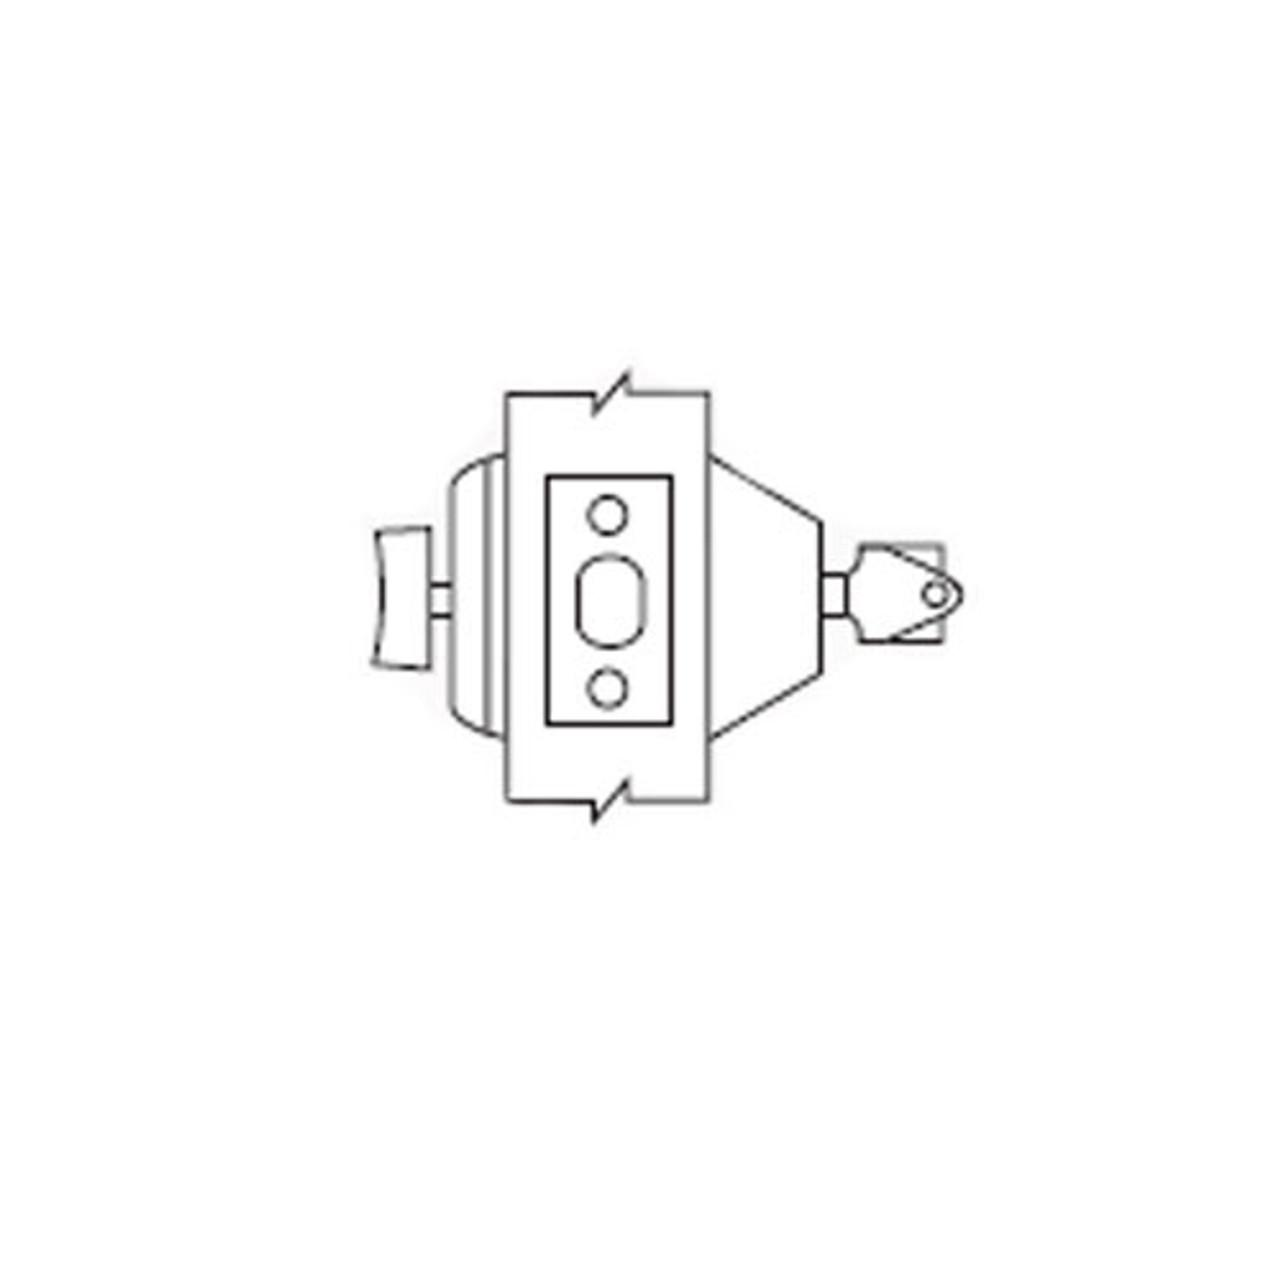 hight resolution of d61 10b arrow lock d series deadbolt single cylinder with thumbturn in dark oxidized satin